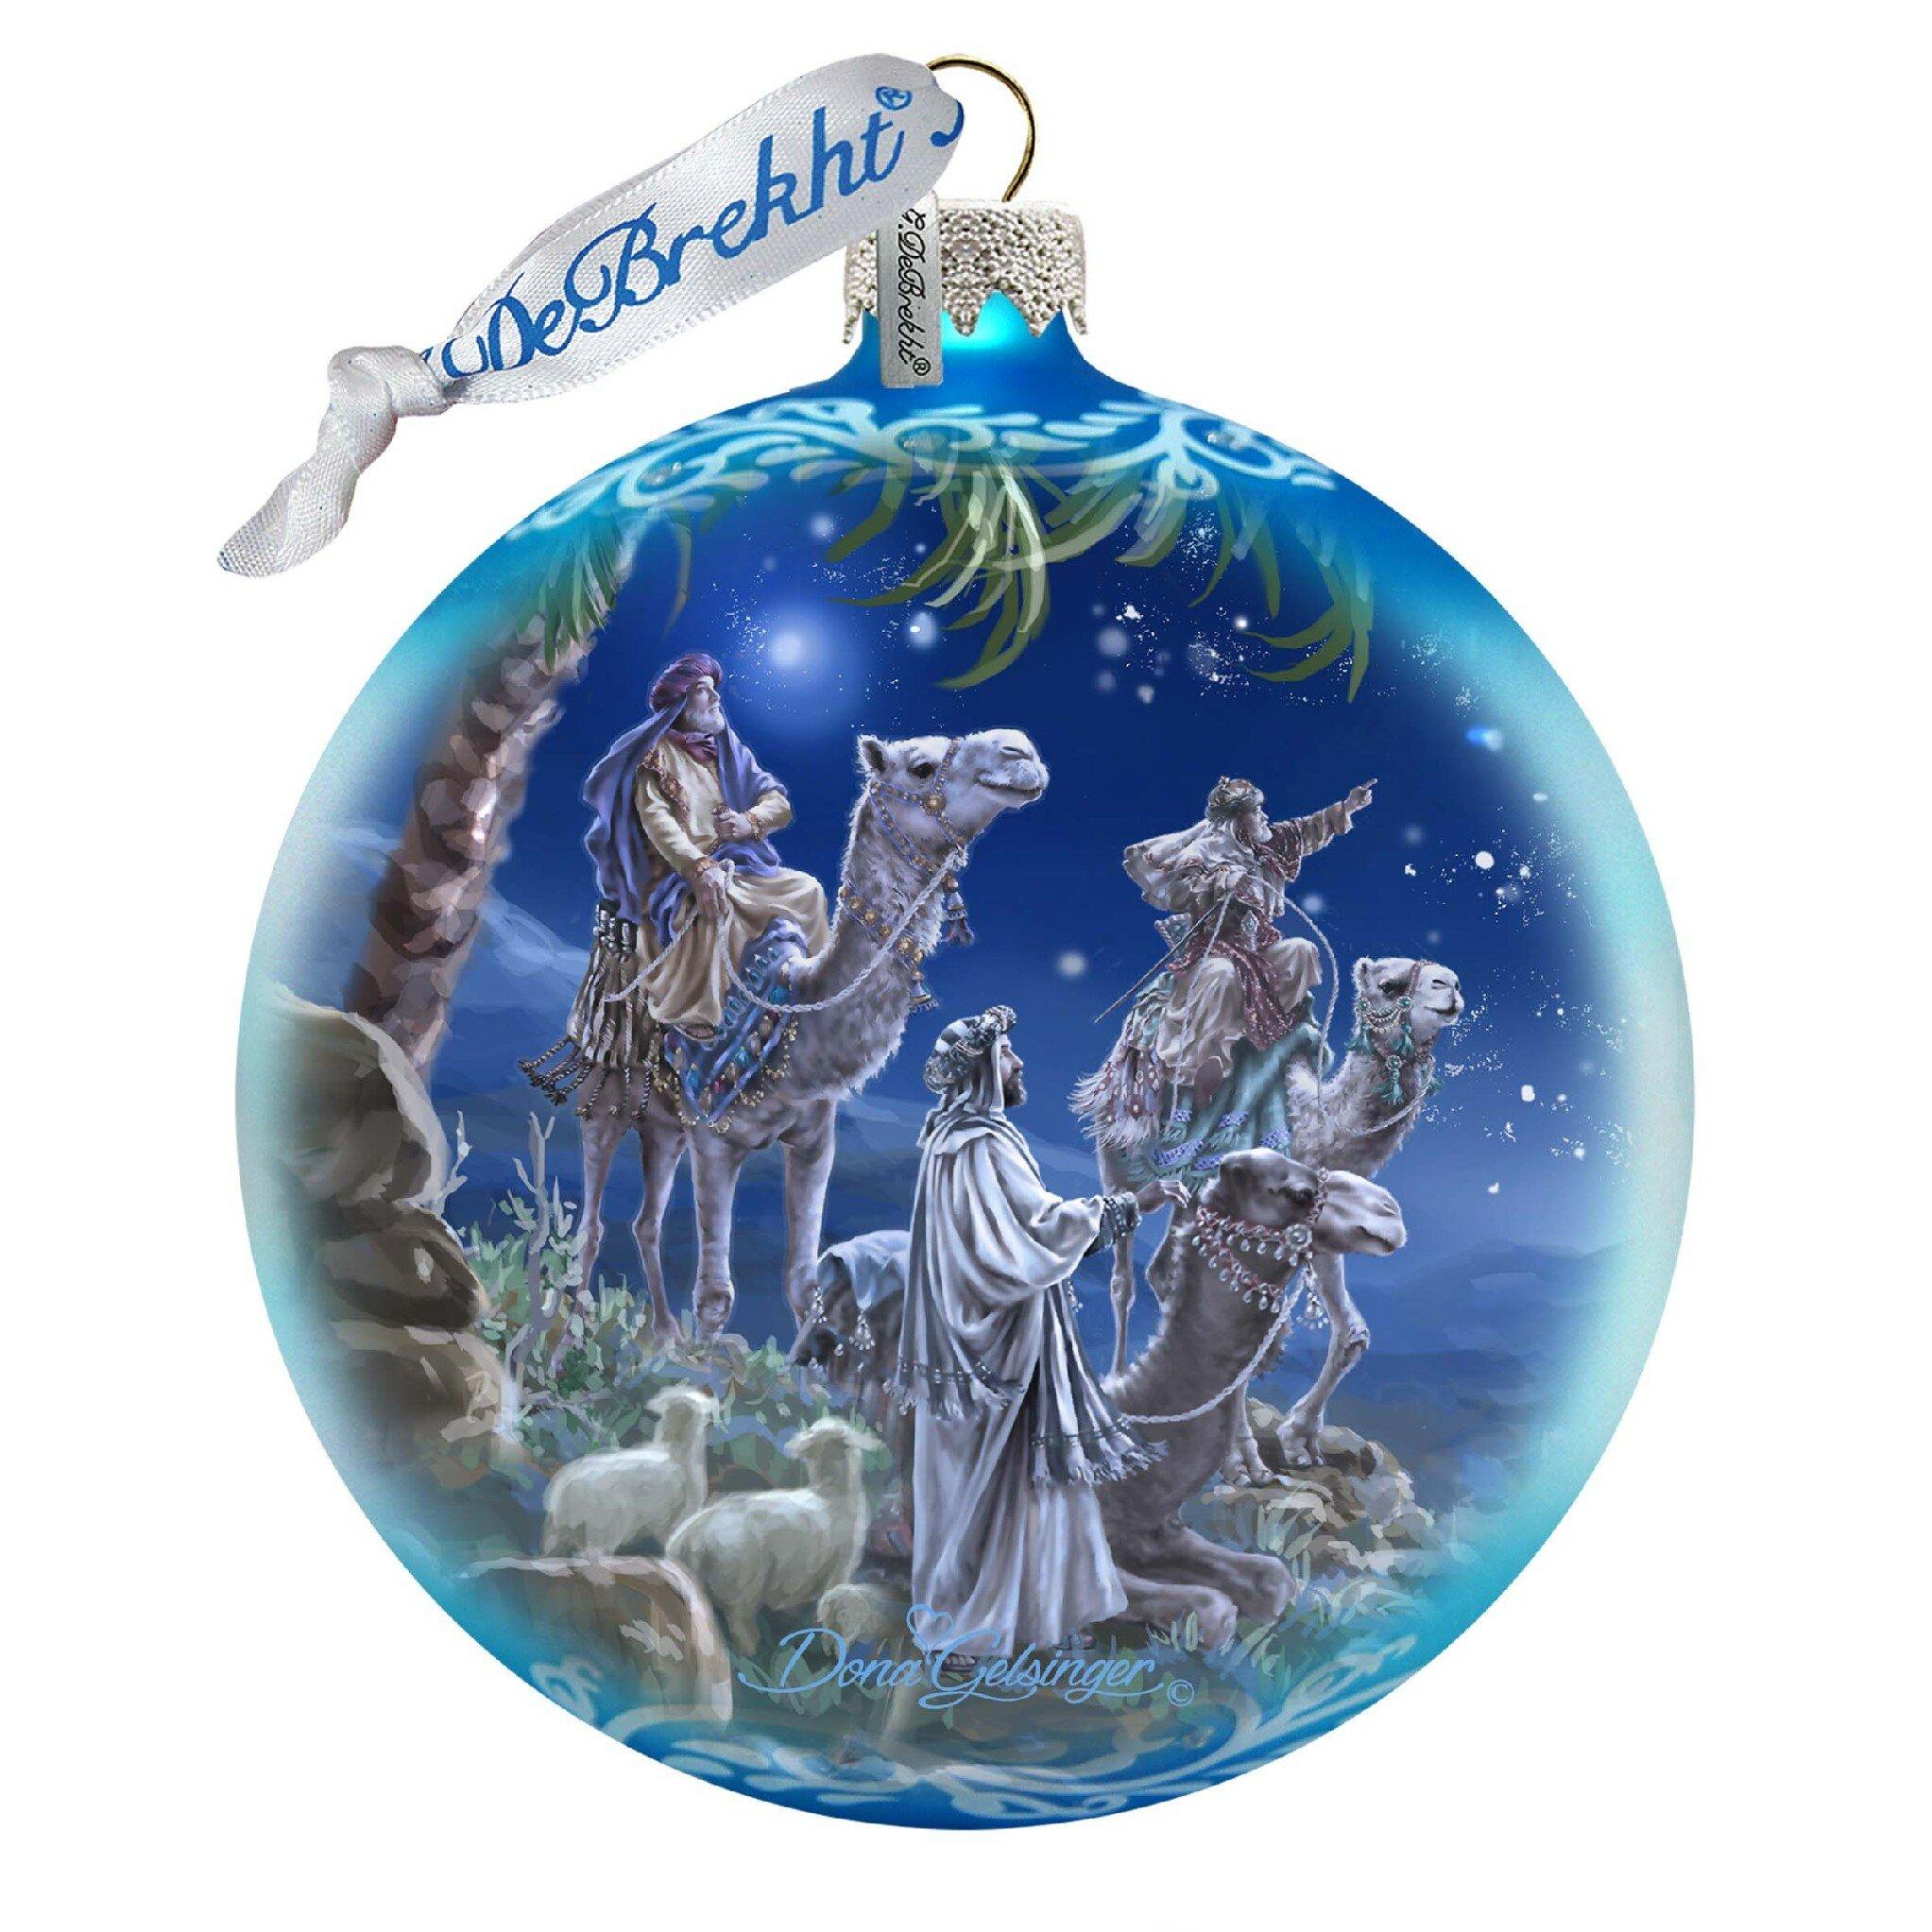 G Debrekht Bo Let Us Adore Him Ball Ornament Wayfair